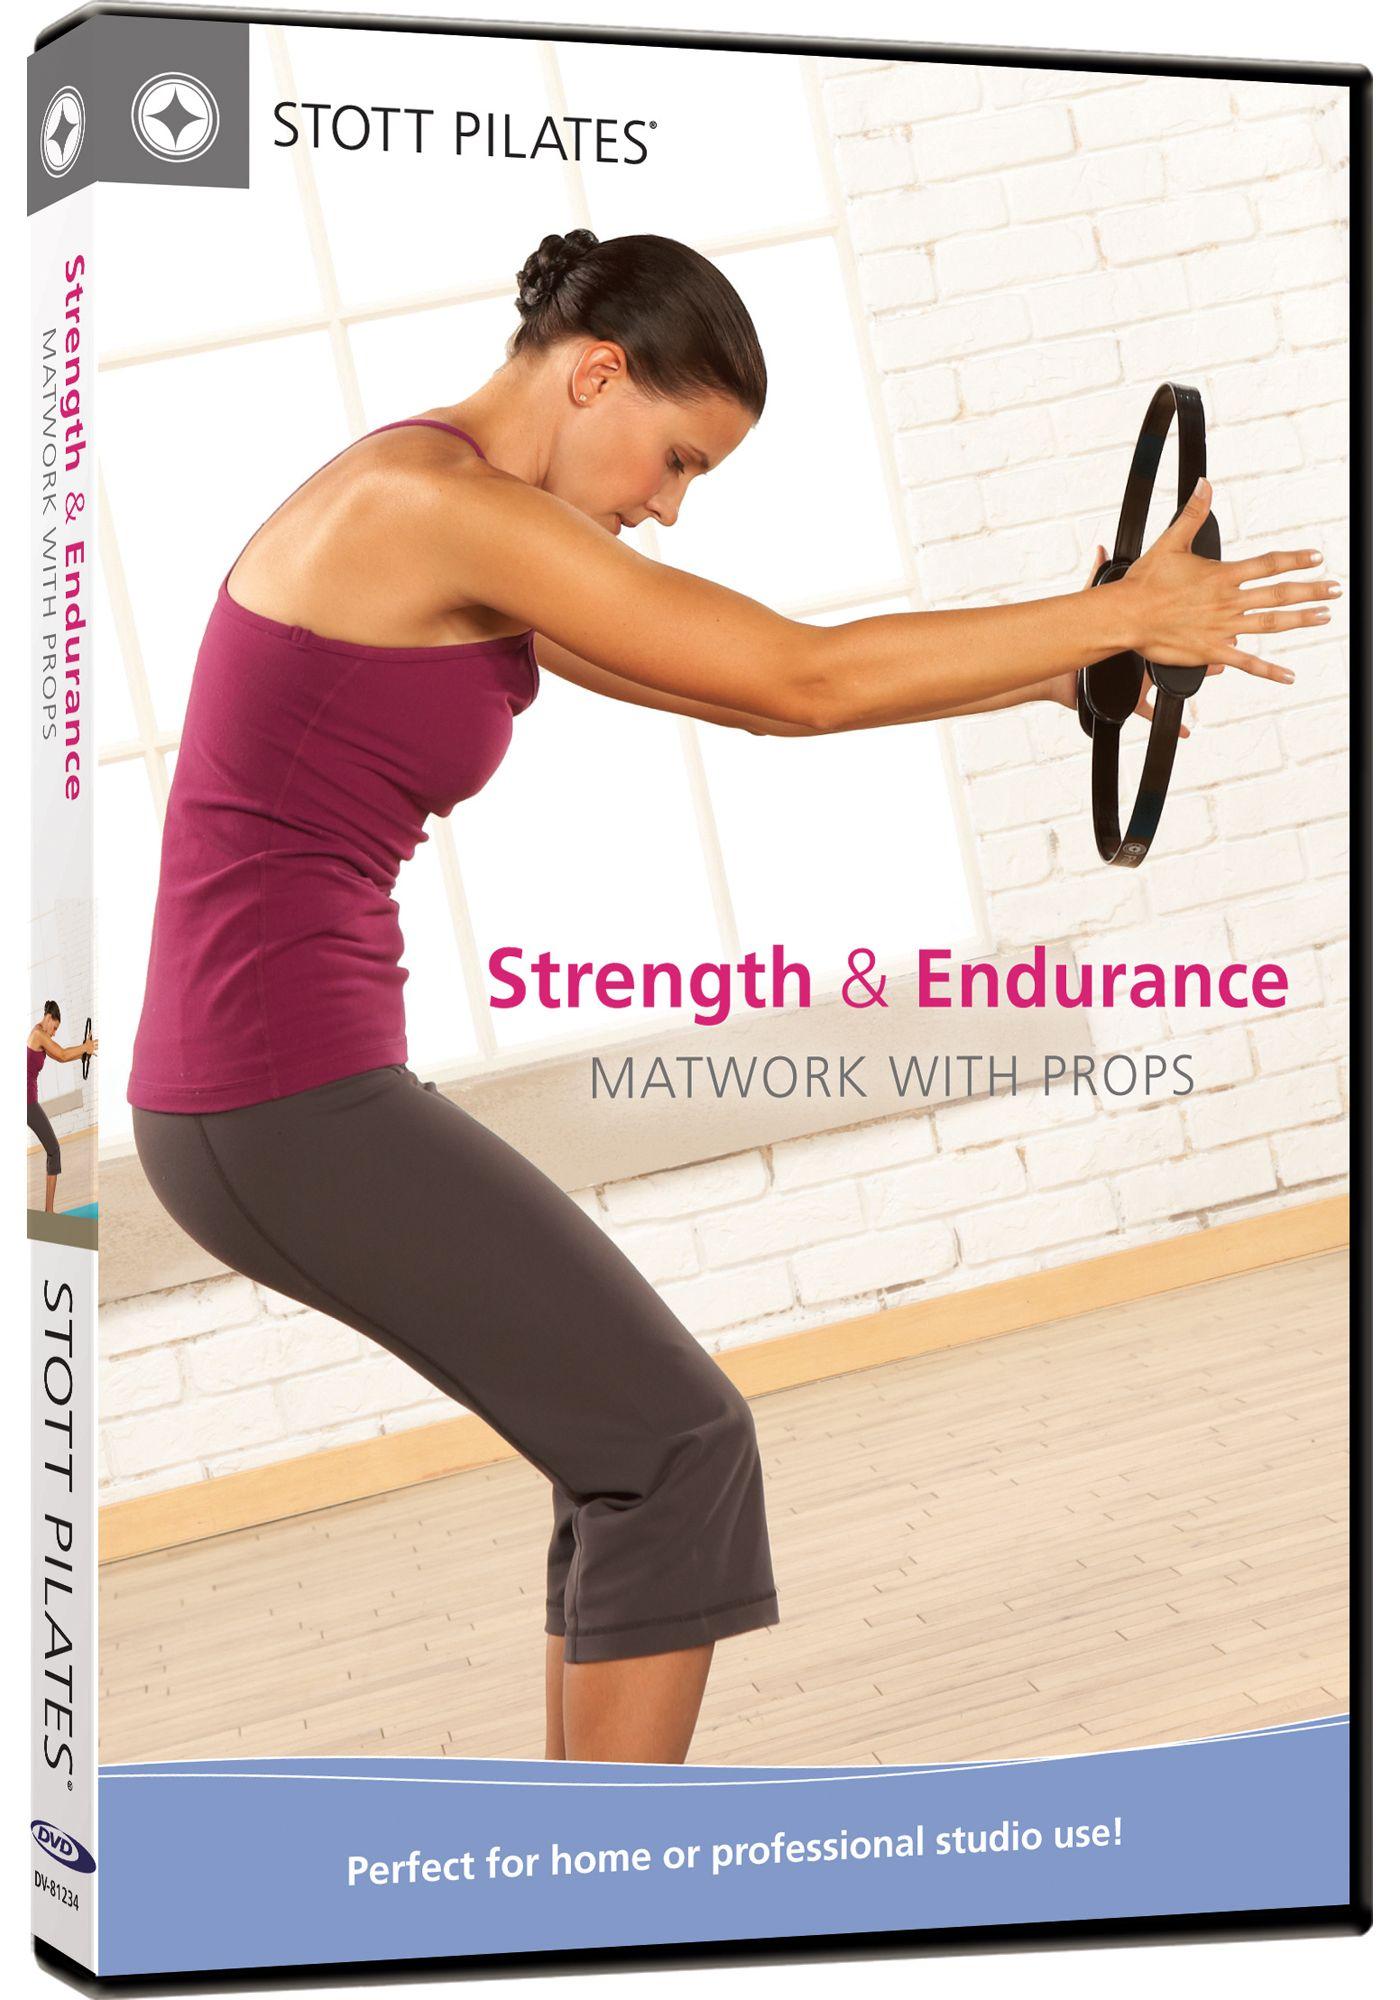 STOTT PILATES Strength and Endurance Matwork DVD